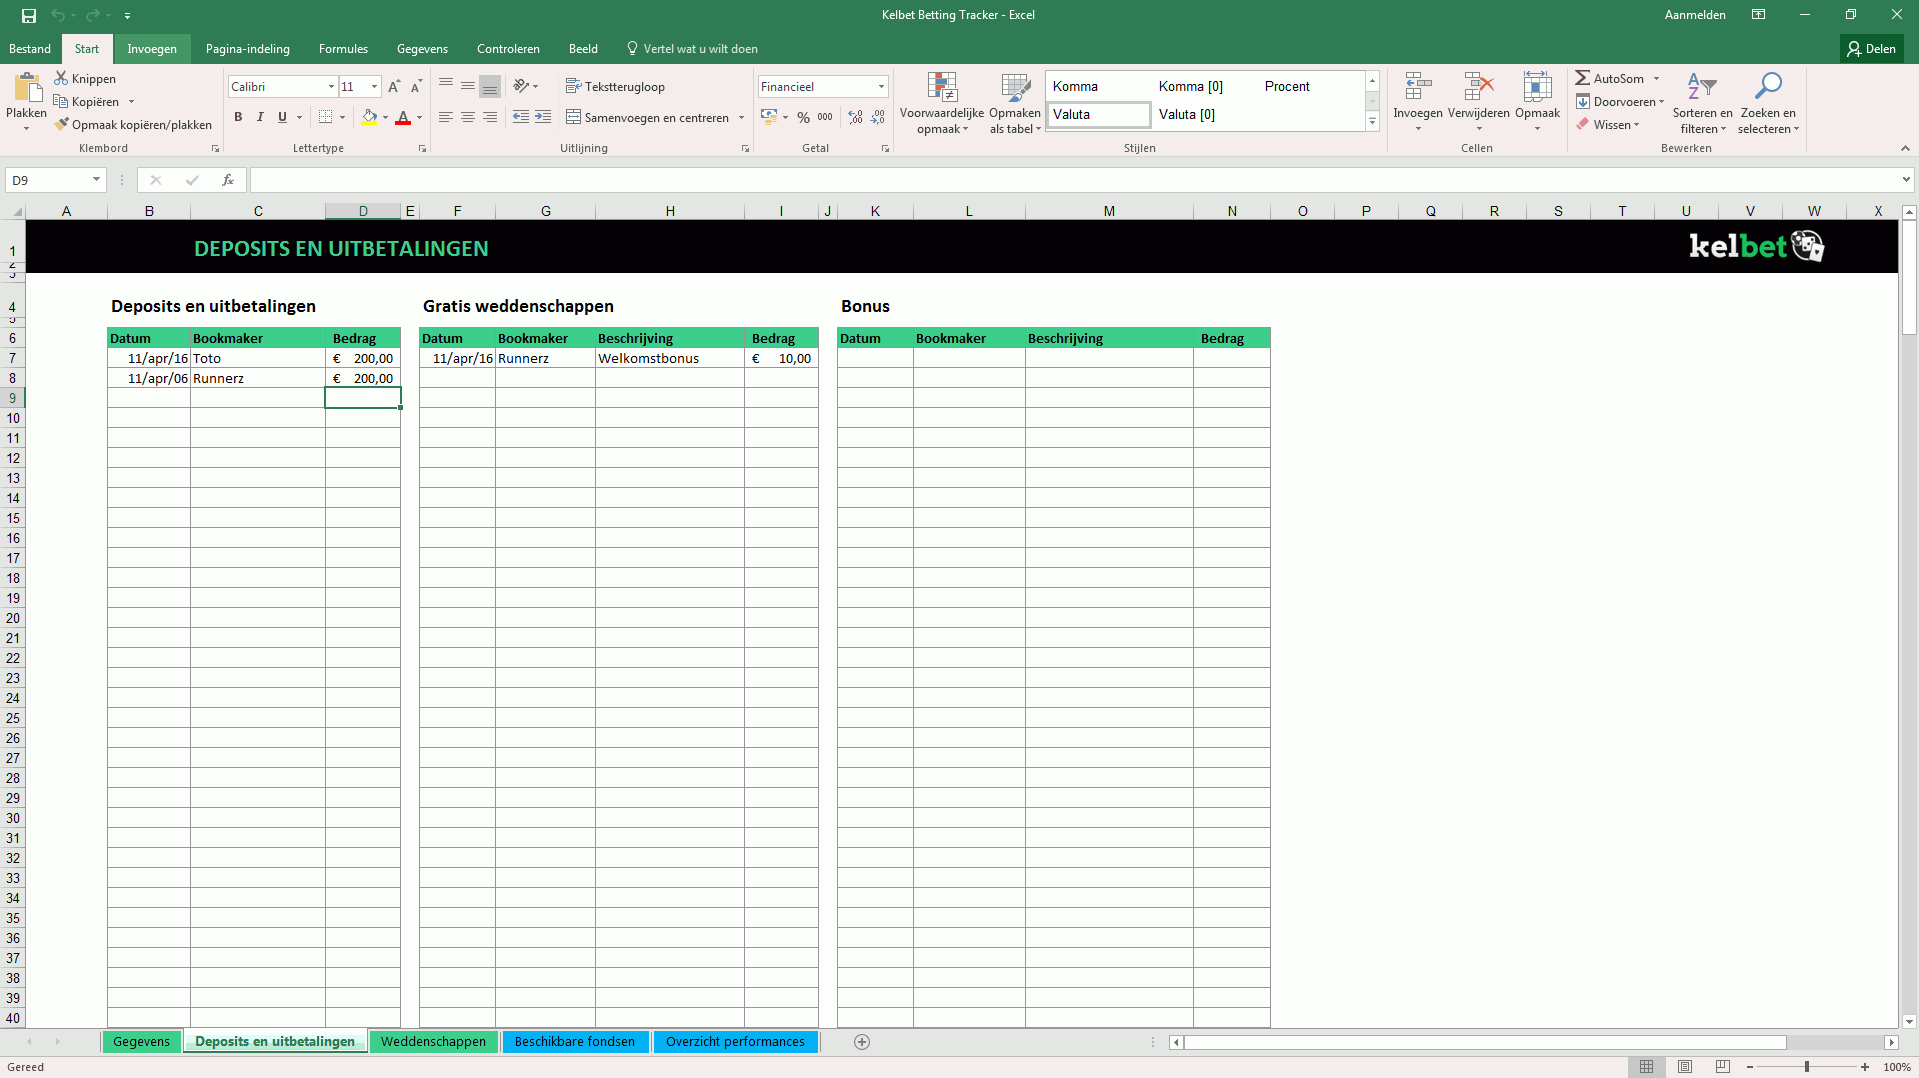 Kelbet betting tracker screenshot 2